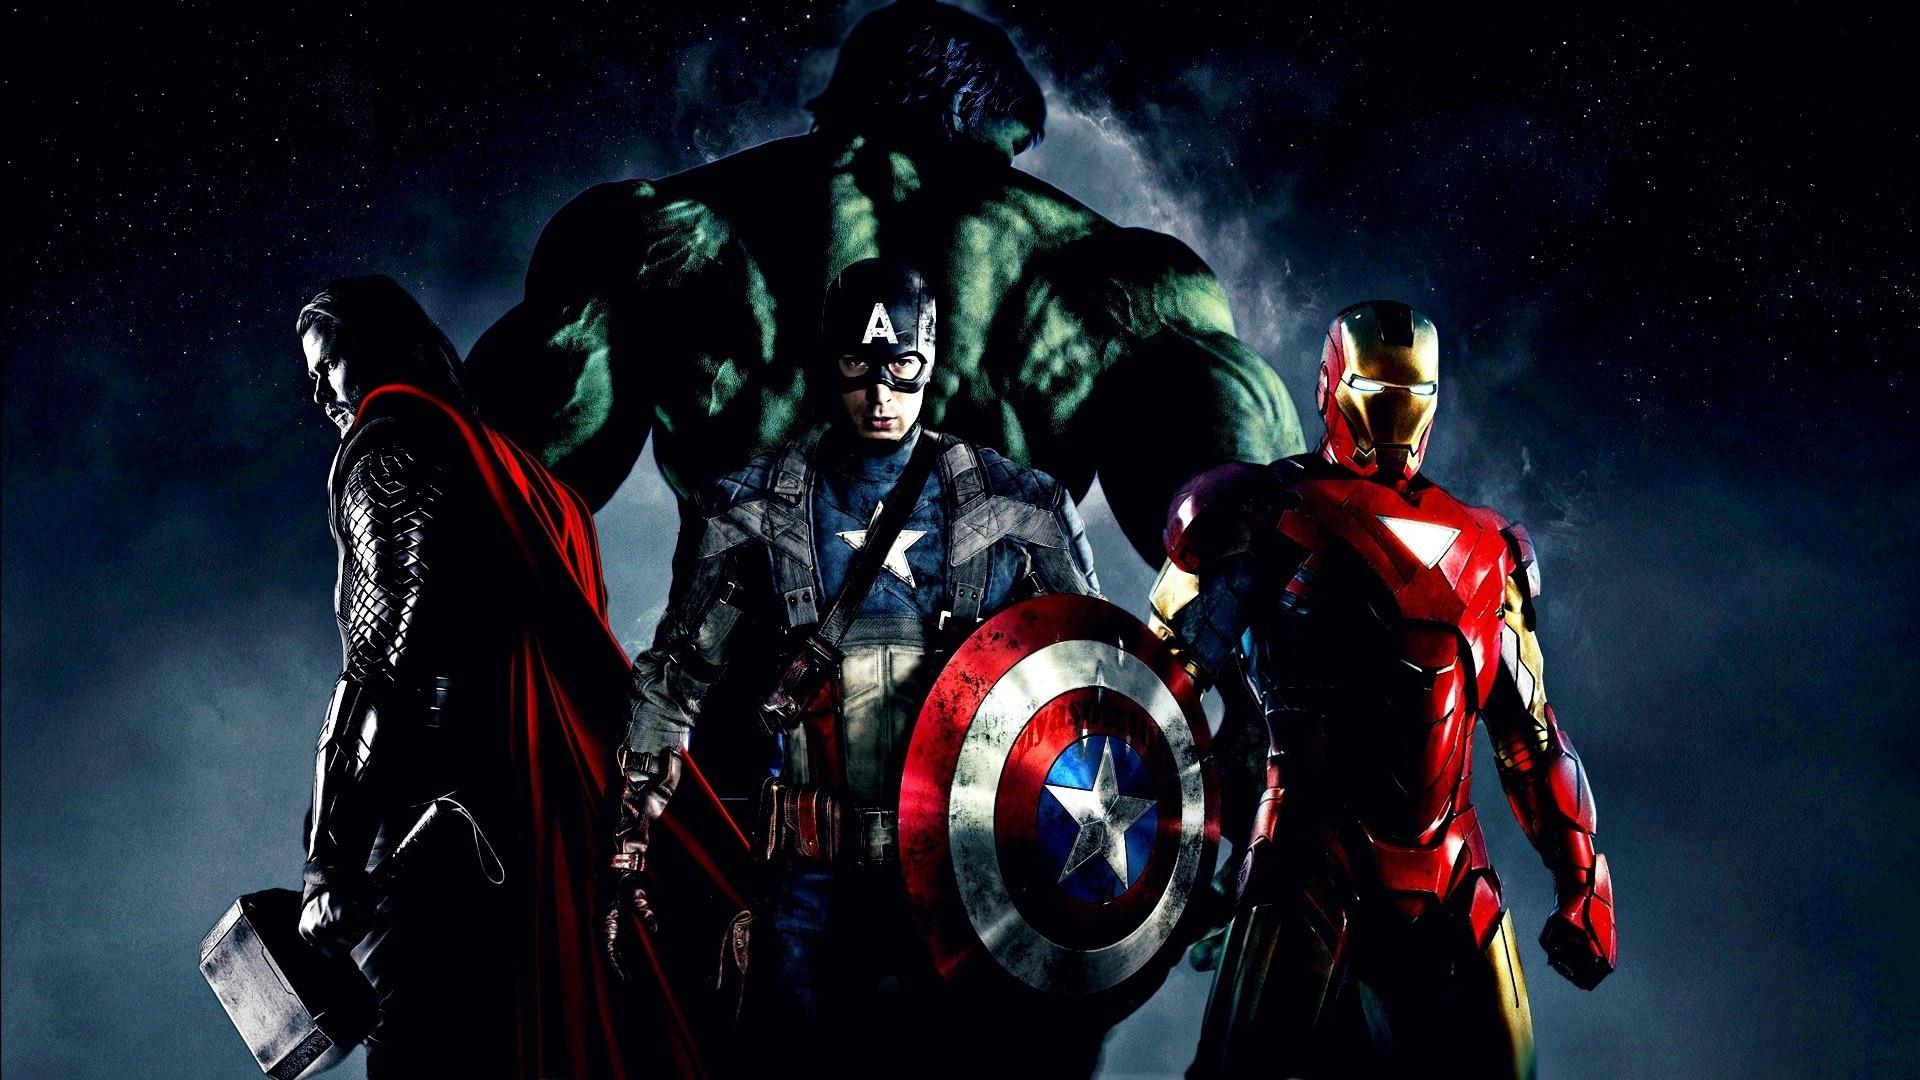 42 Avengers Hd Wallpapers 1080p On Wallpapersafari